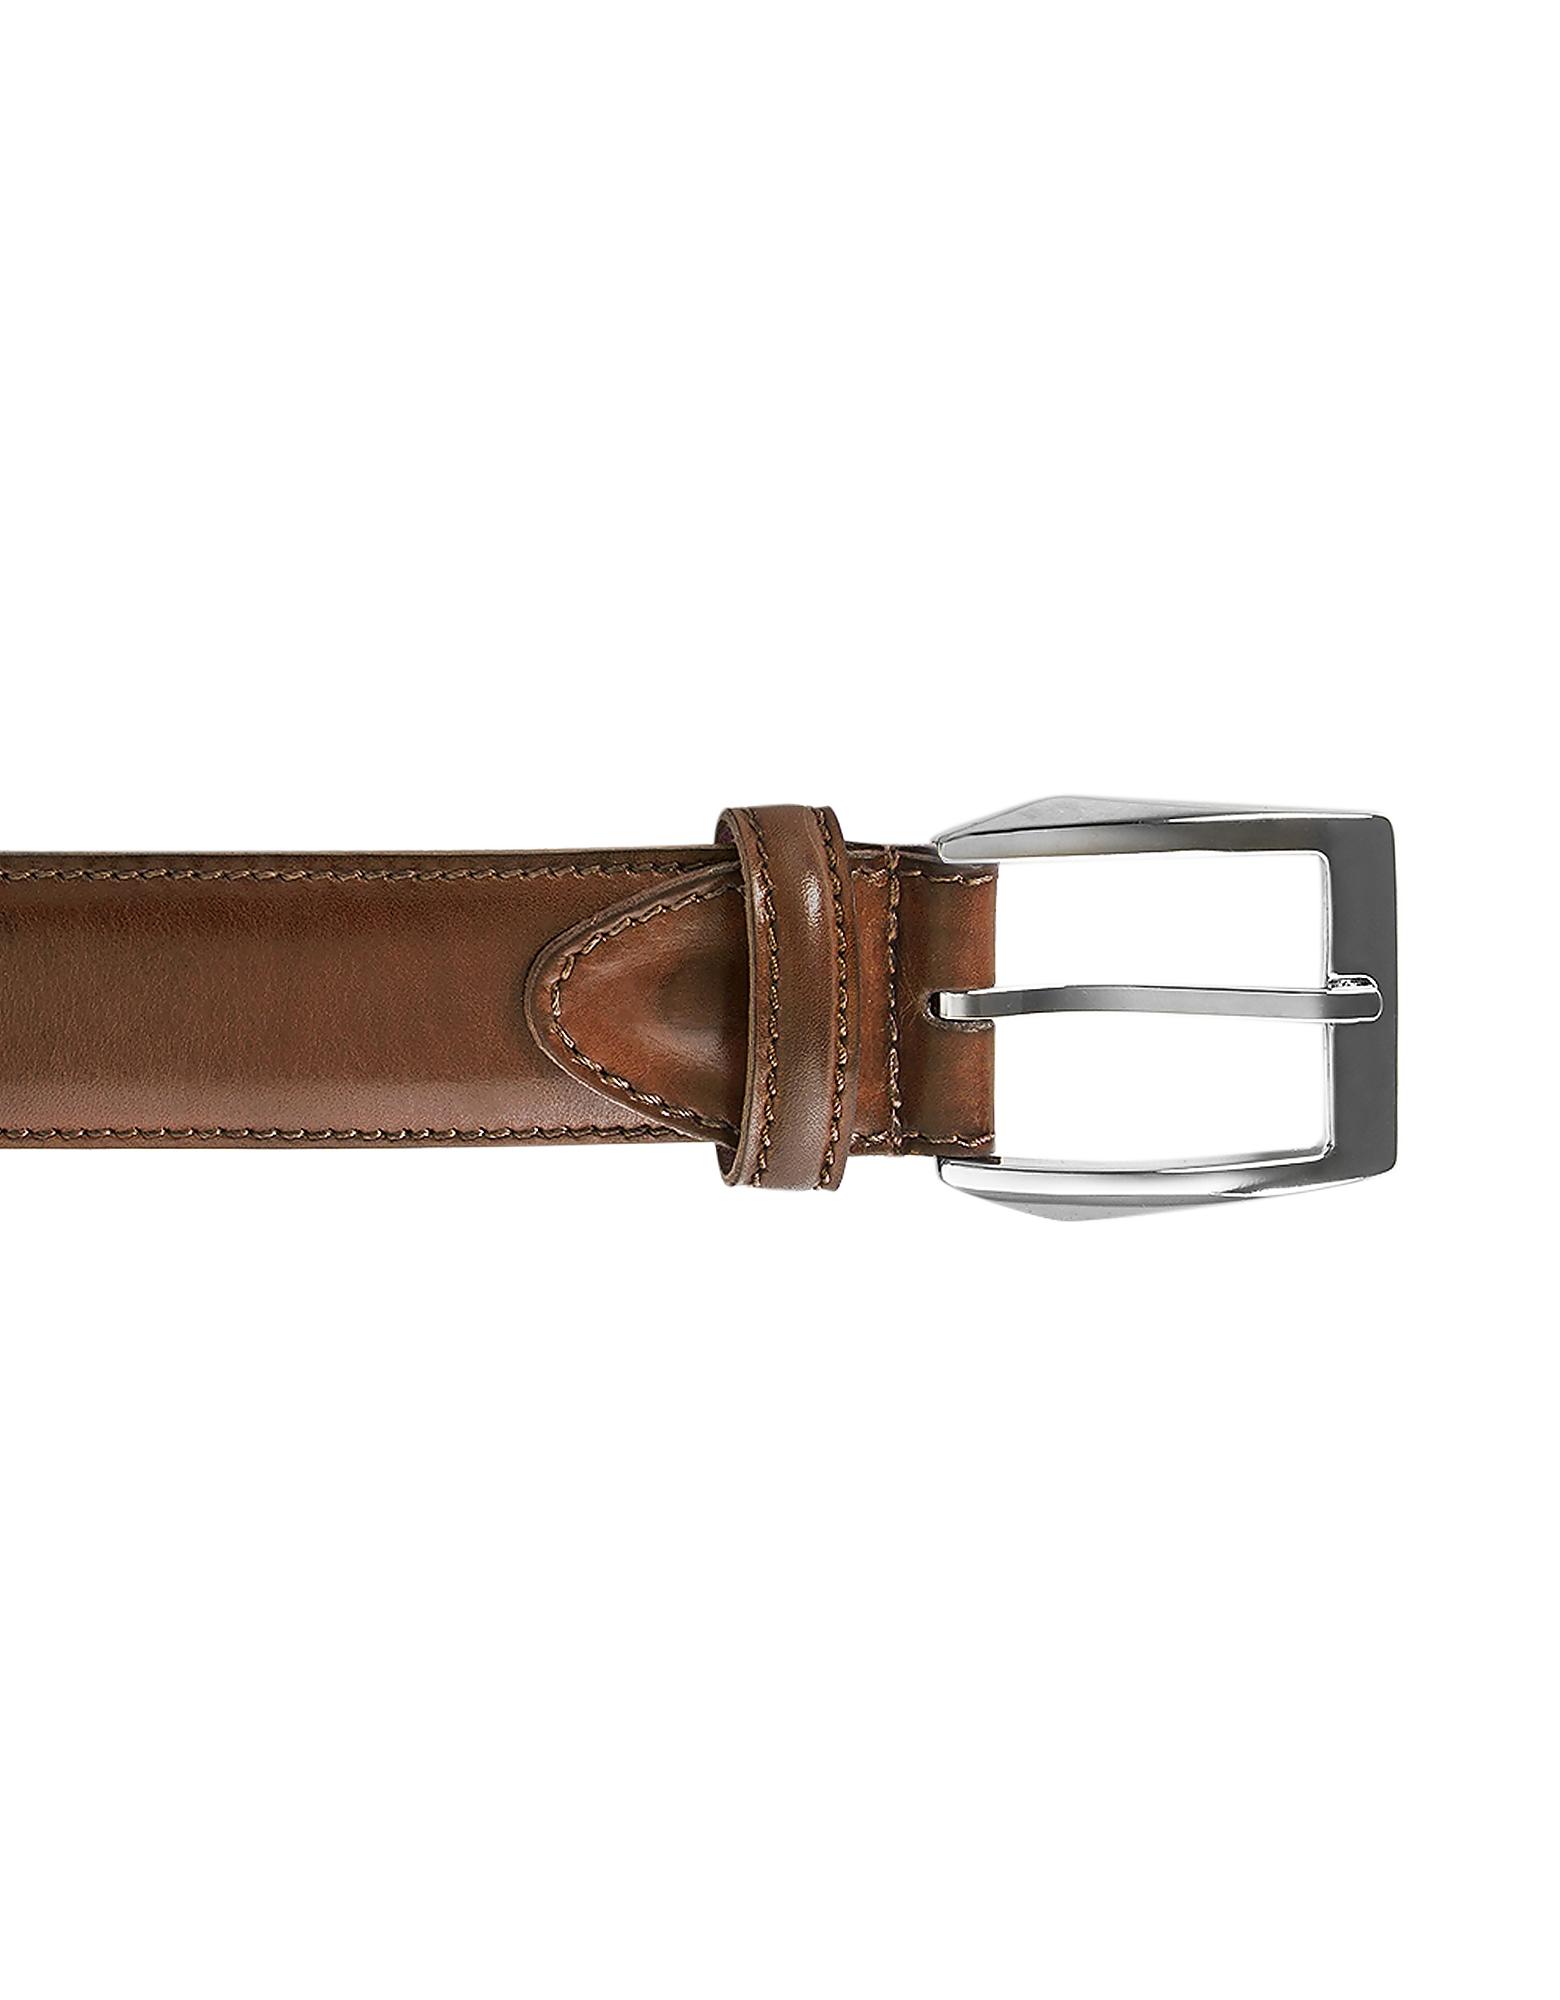 Pakerson Designer Men's Belts, Calci Cocoa Handmade Italian Leather Belt